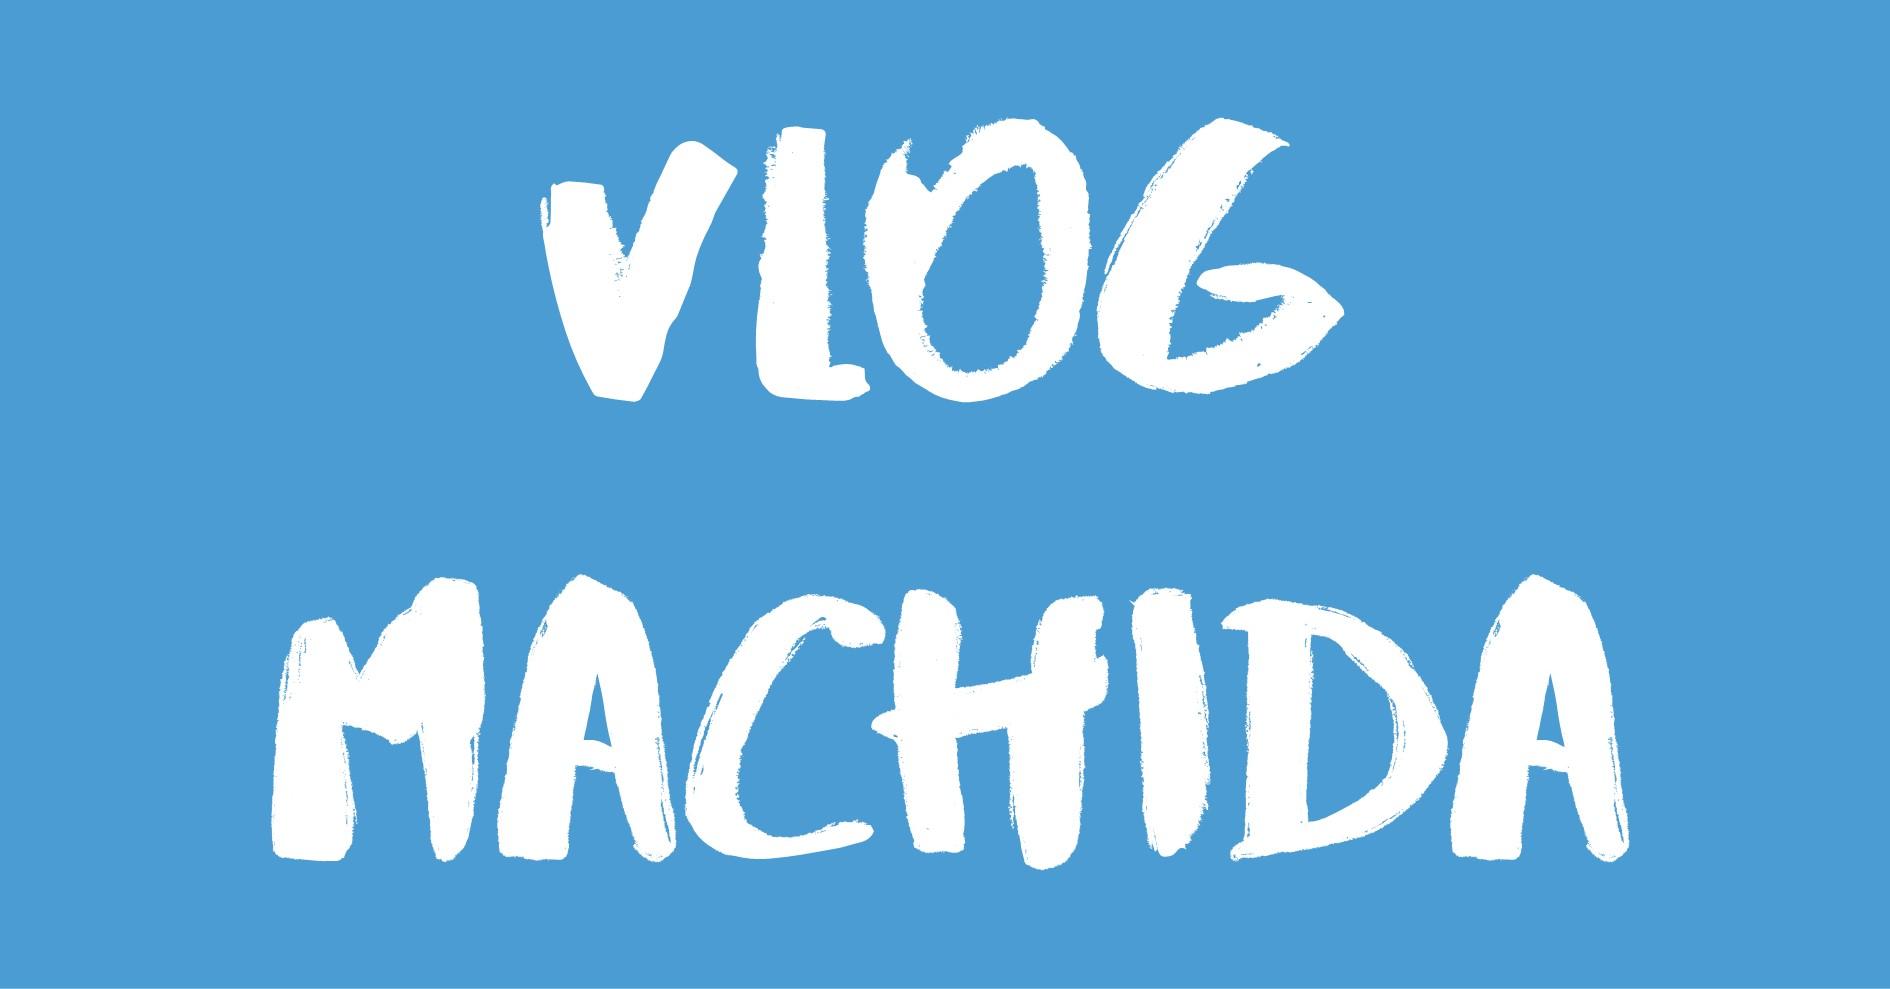 [Vlog] 町田市周辺エリア / Machida